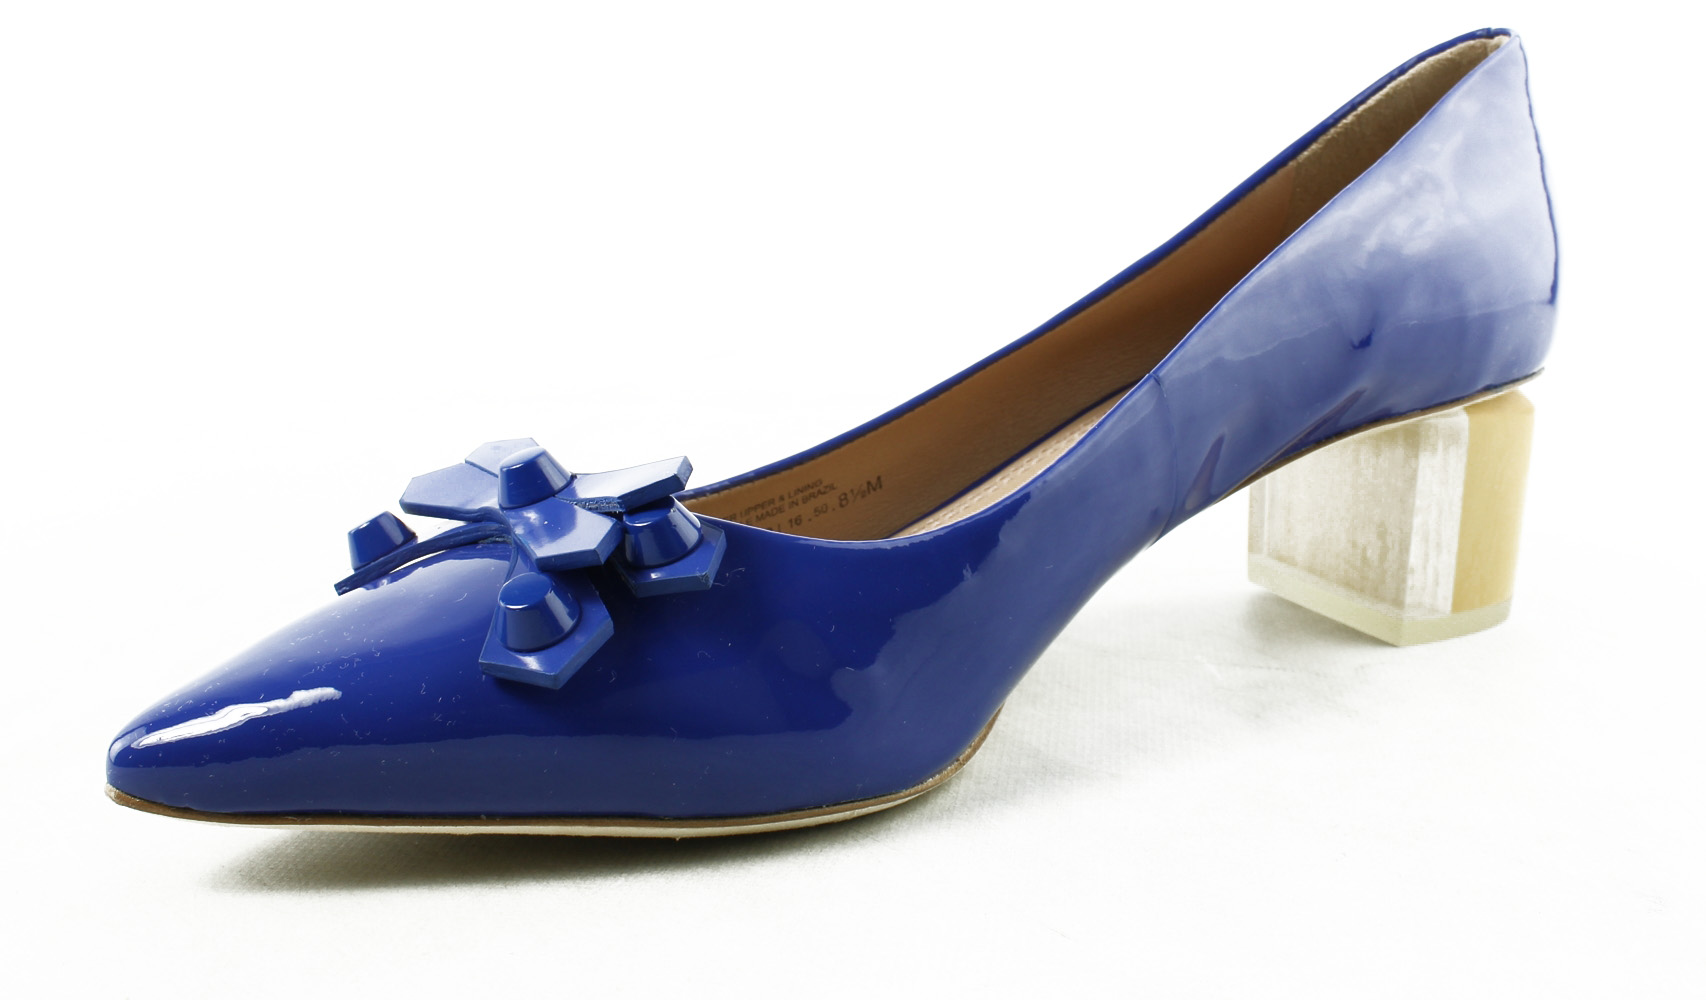 Tory Burch Womens  Blue Pumps Heels Size 8 New